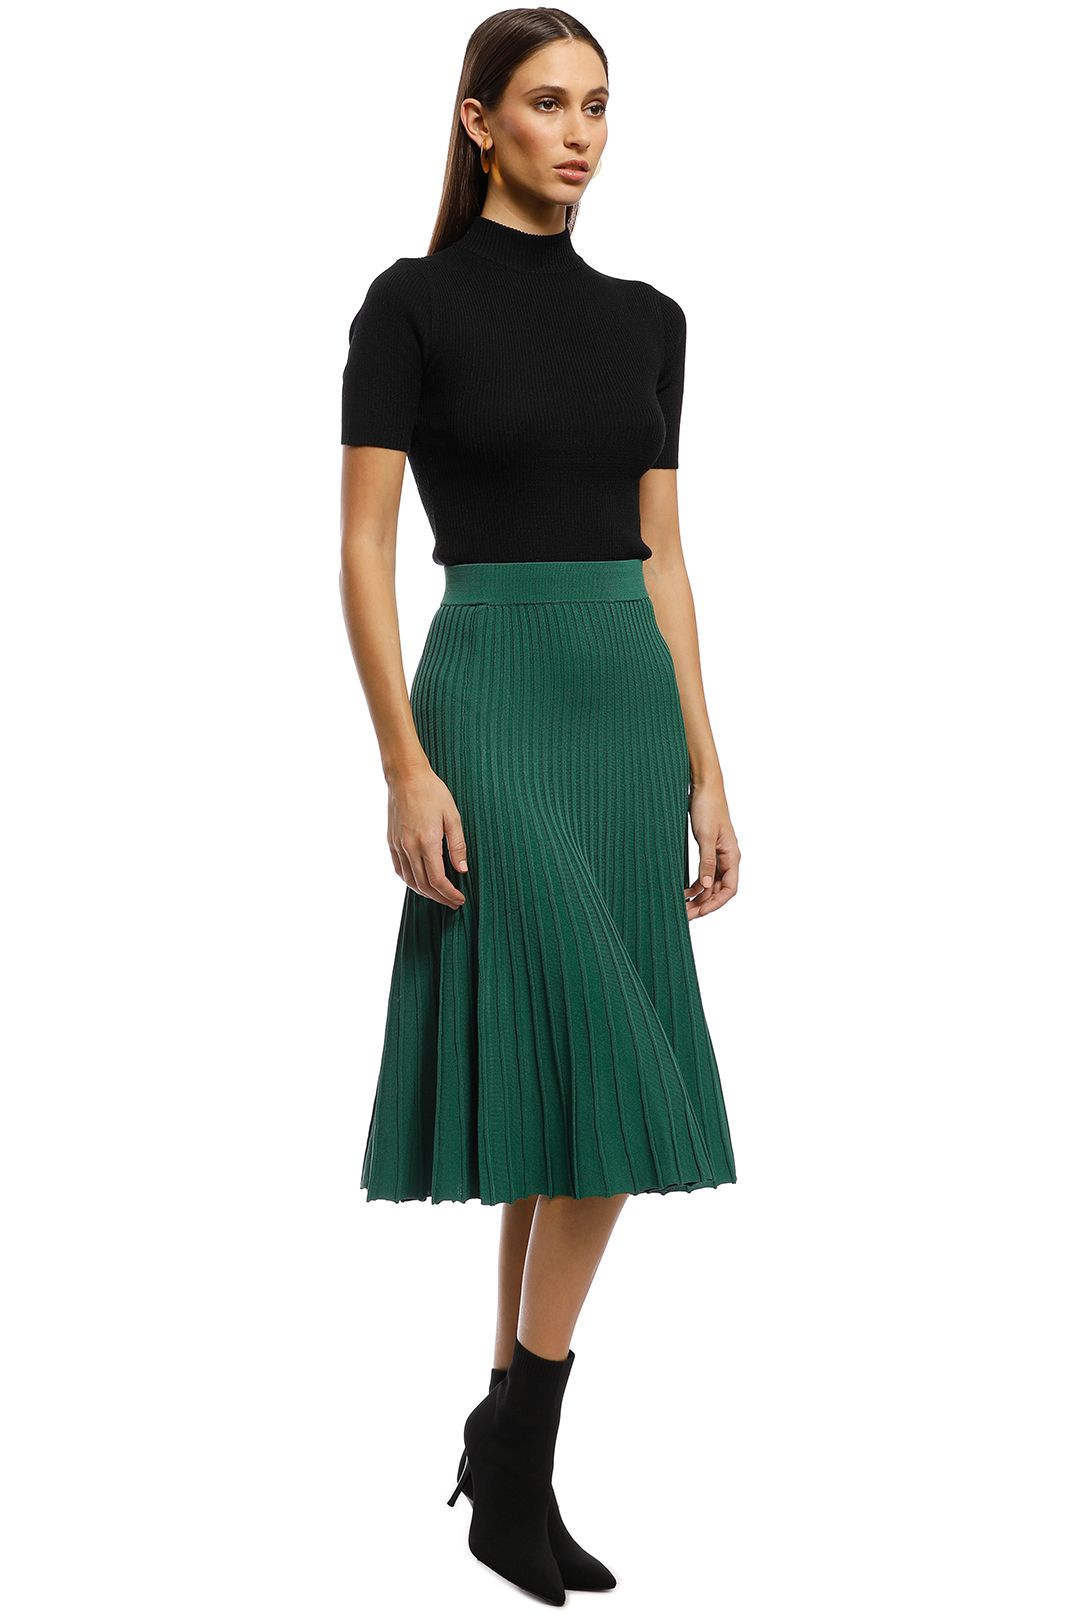 Saba - Ruby Rib Knit Skirt - Green - Side